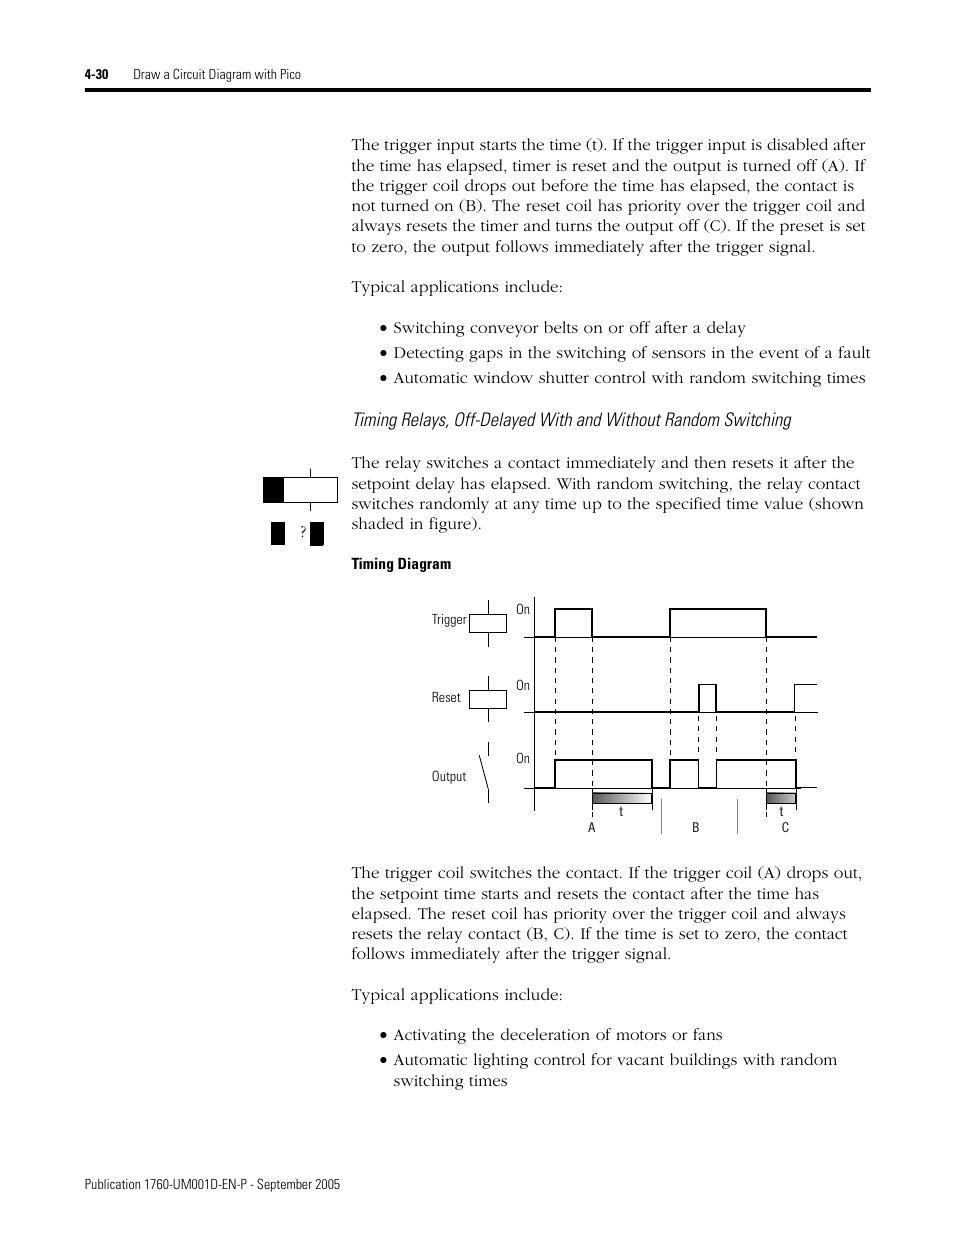 rockwell automation 1760 xxxx pico controller user manual user rh manualsdir com pico gfx-70 controller user manual Allen Bradley Pico